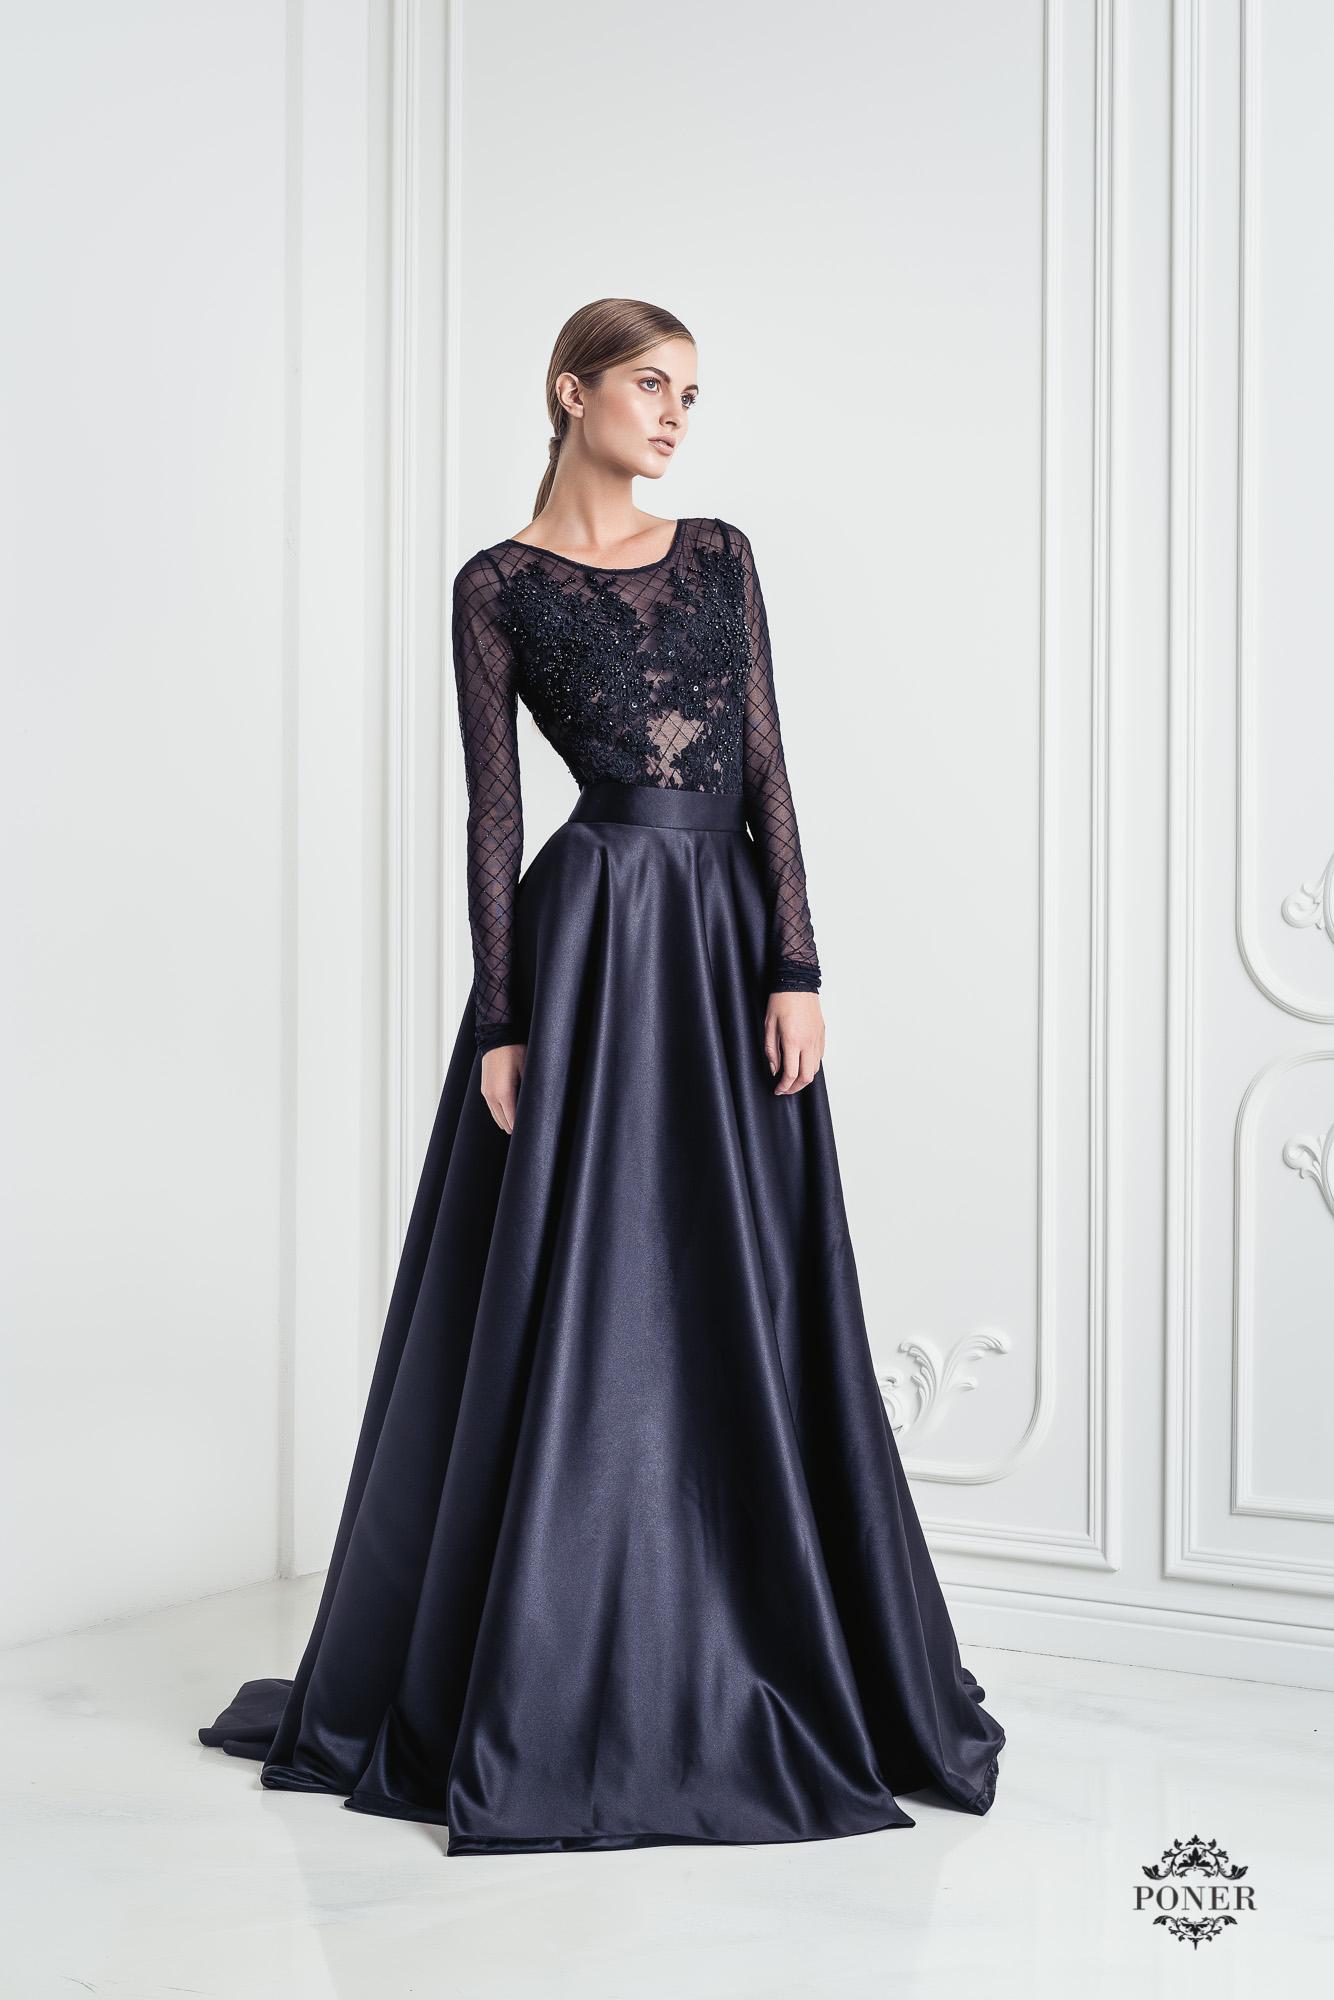 poner-fashion2018 (6)